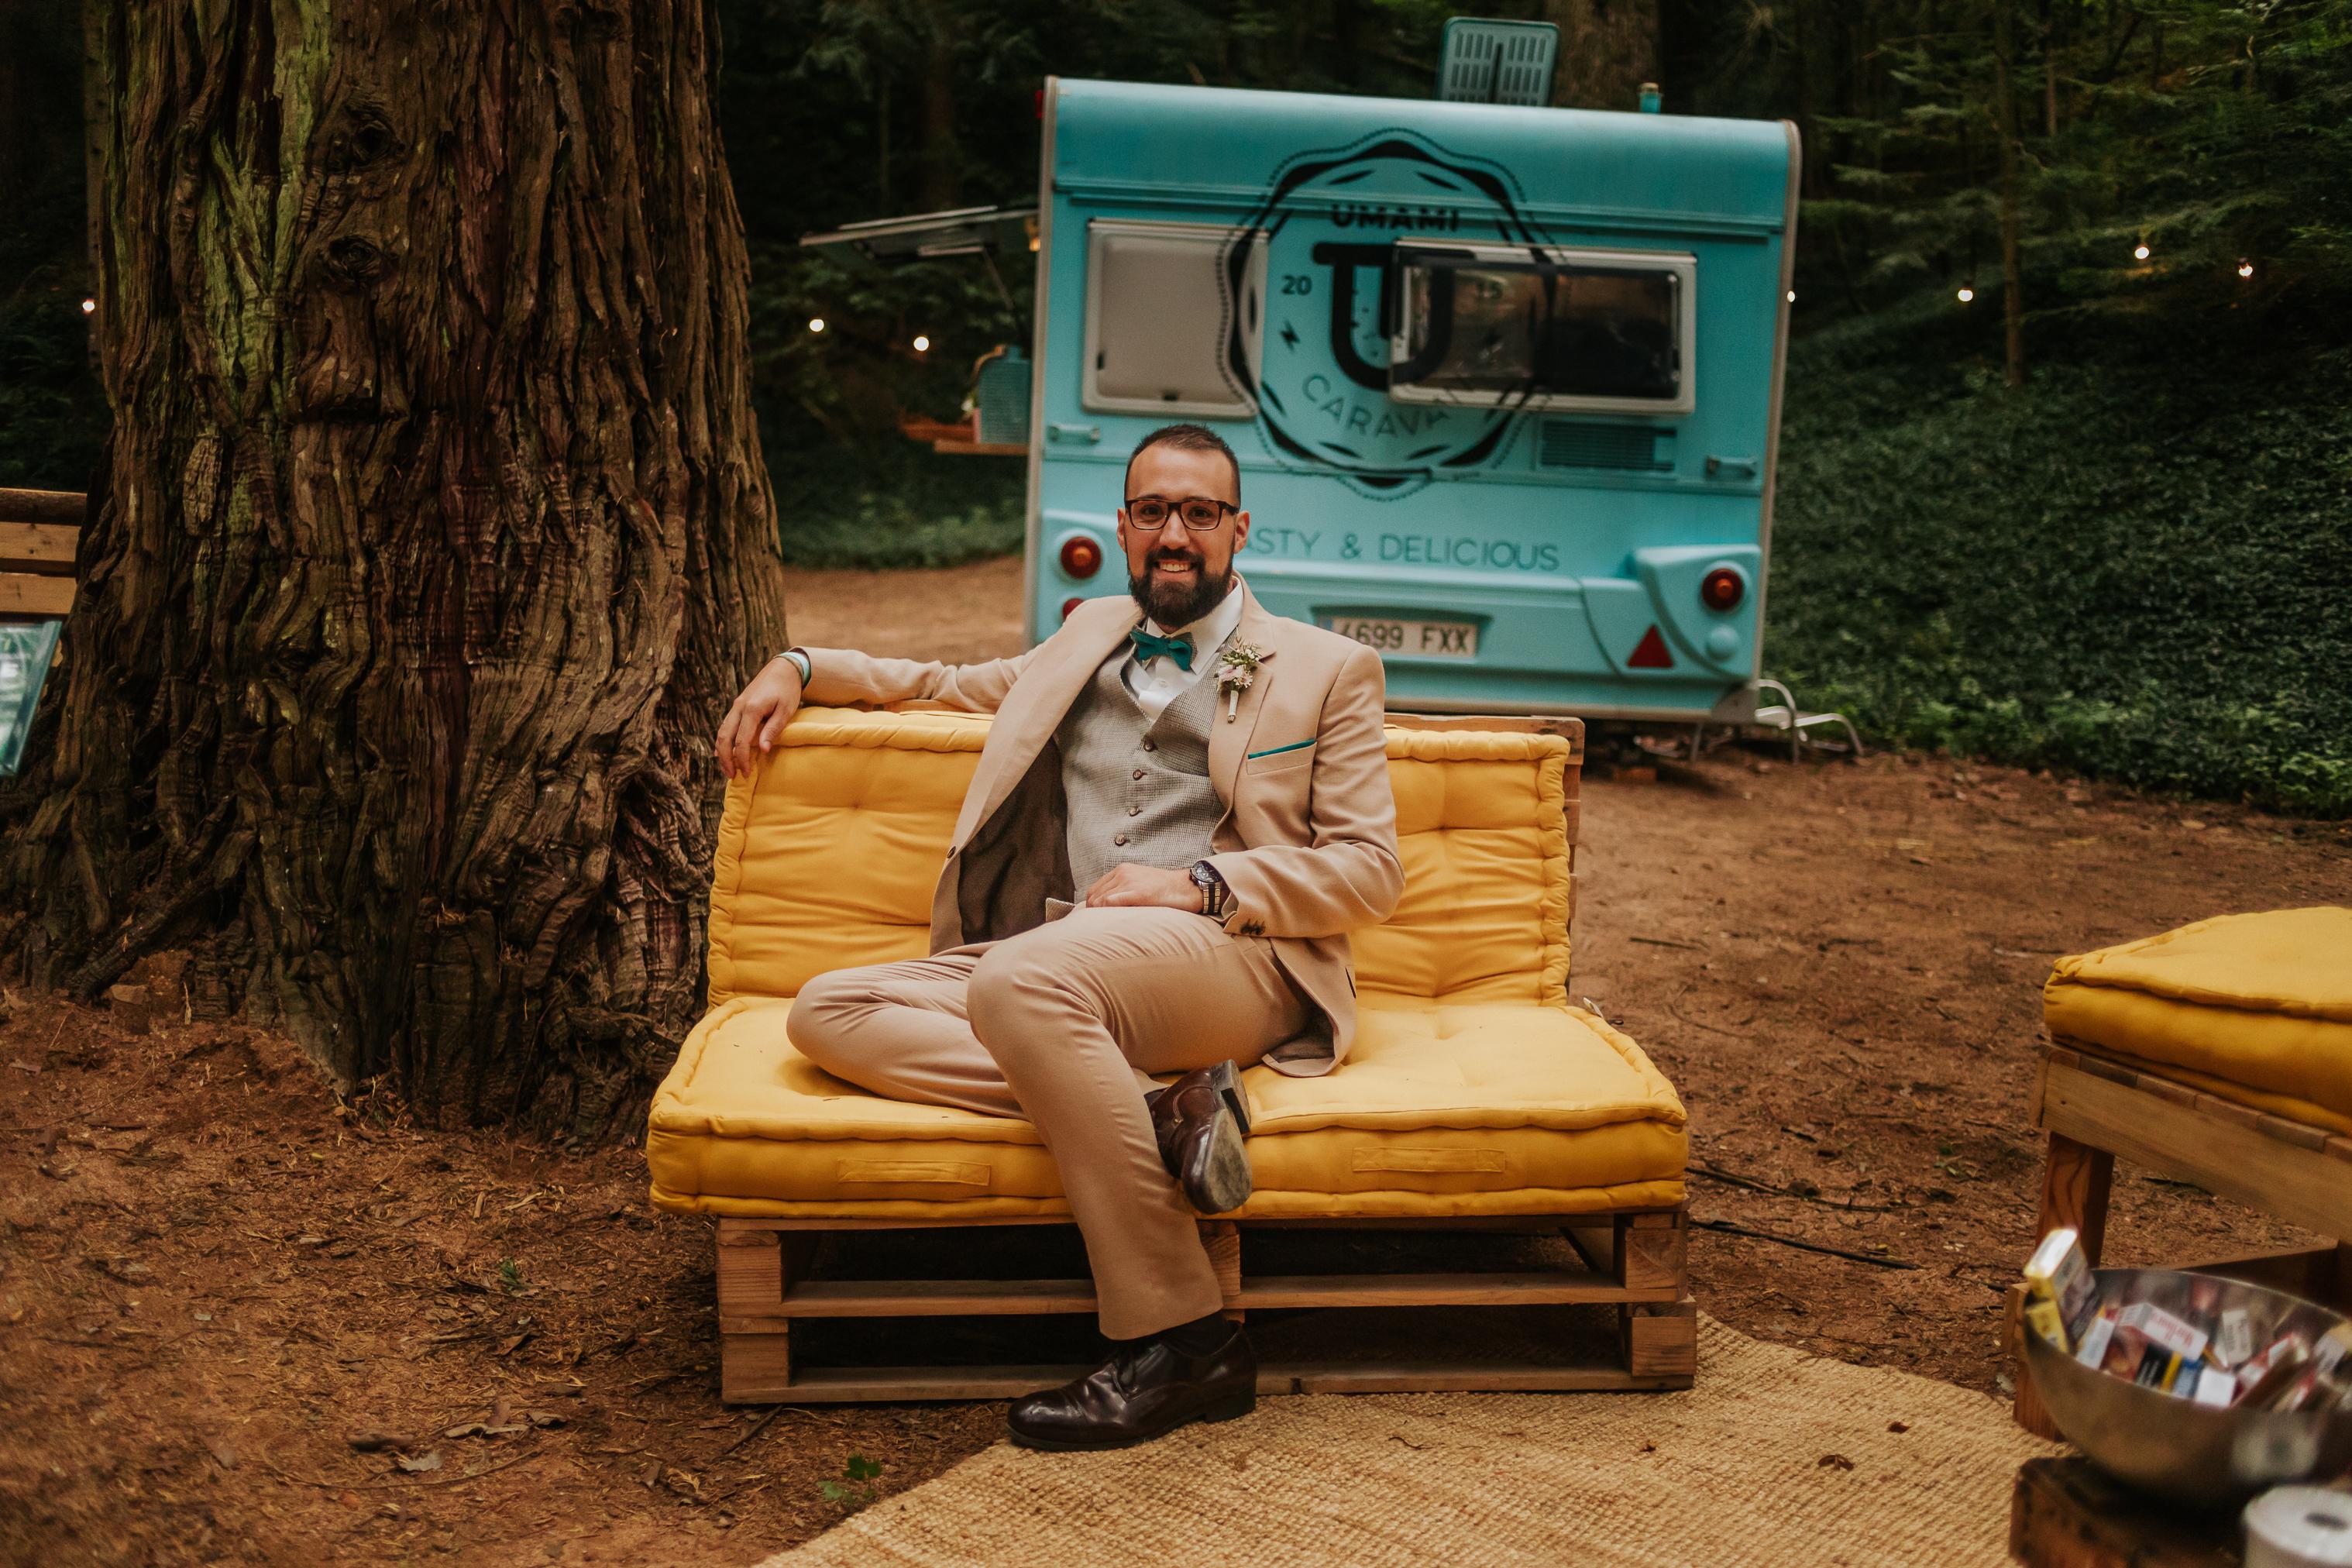 fotógrafo de boda barcelona :: Boda en el bosque :: boda nomada :: Casaments al bosc :: Nòmades :: Country wedding :: Boda de cuento :: Boda en espinelves :: arboretum masjoan